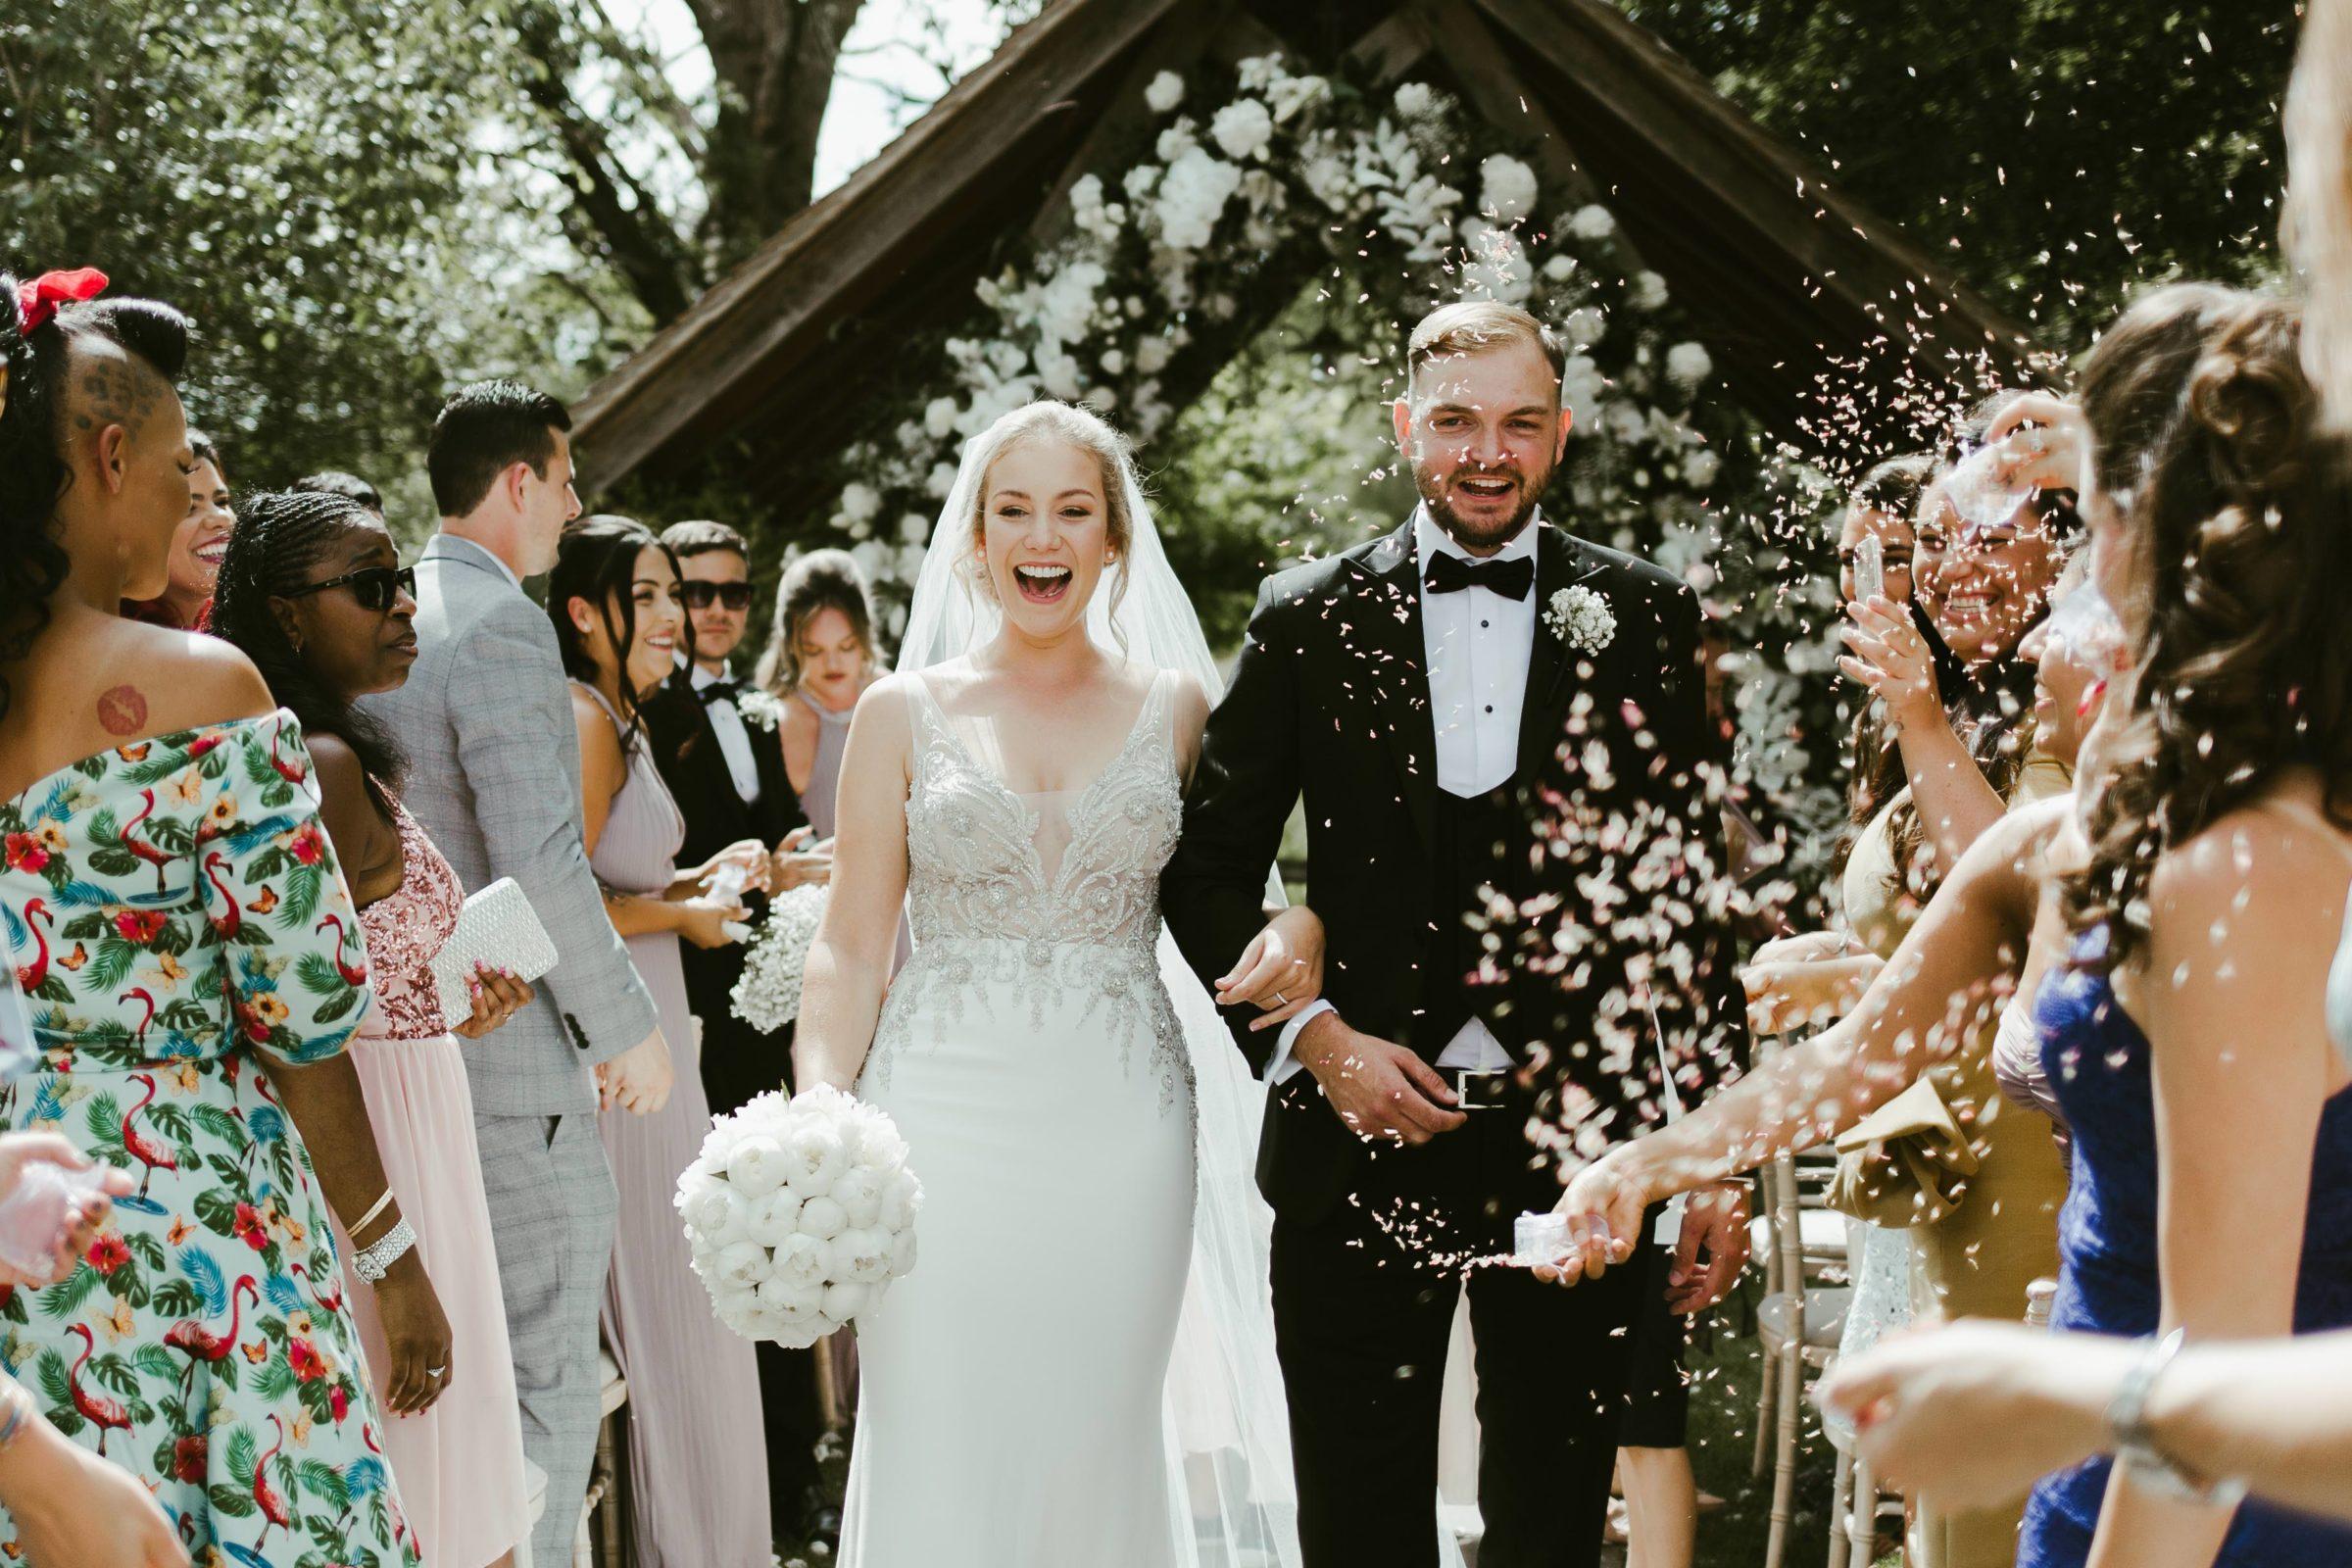 millbridge-court-wedding-venue-frensham-surrey-uk-photography-photographer-confetti-fun